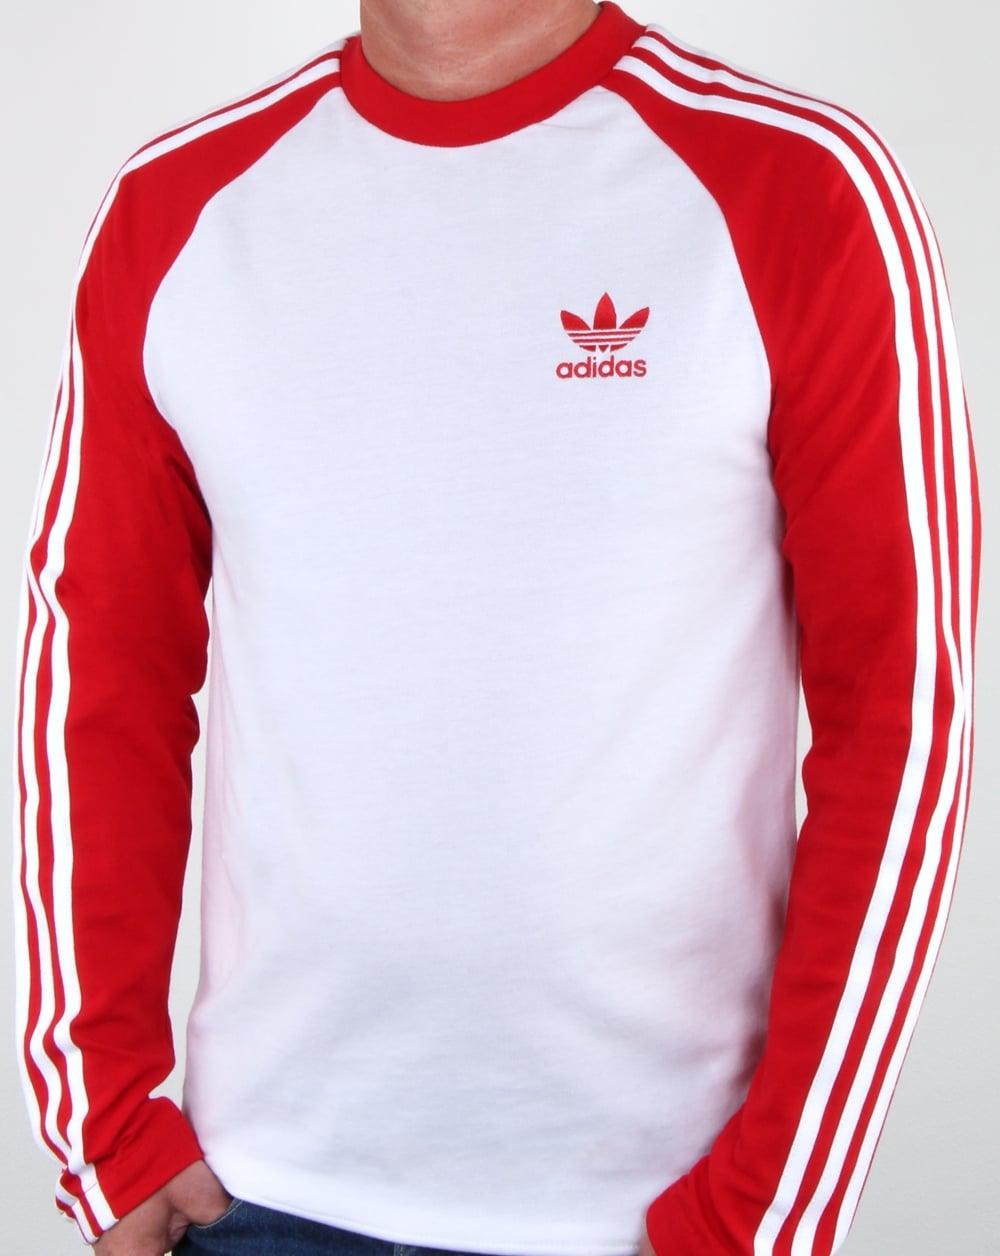 Adidas Originals Long Sleeve 3 Stripes T Shirt White Red